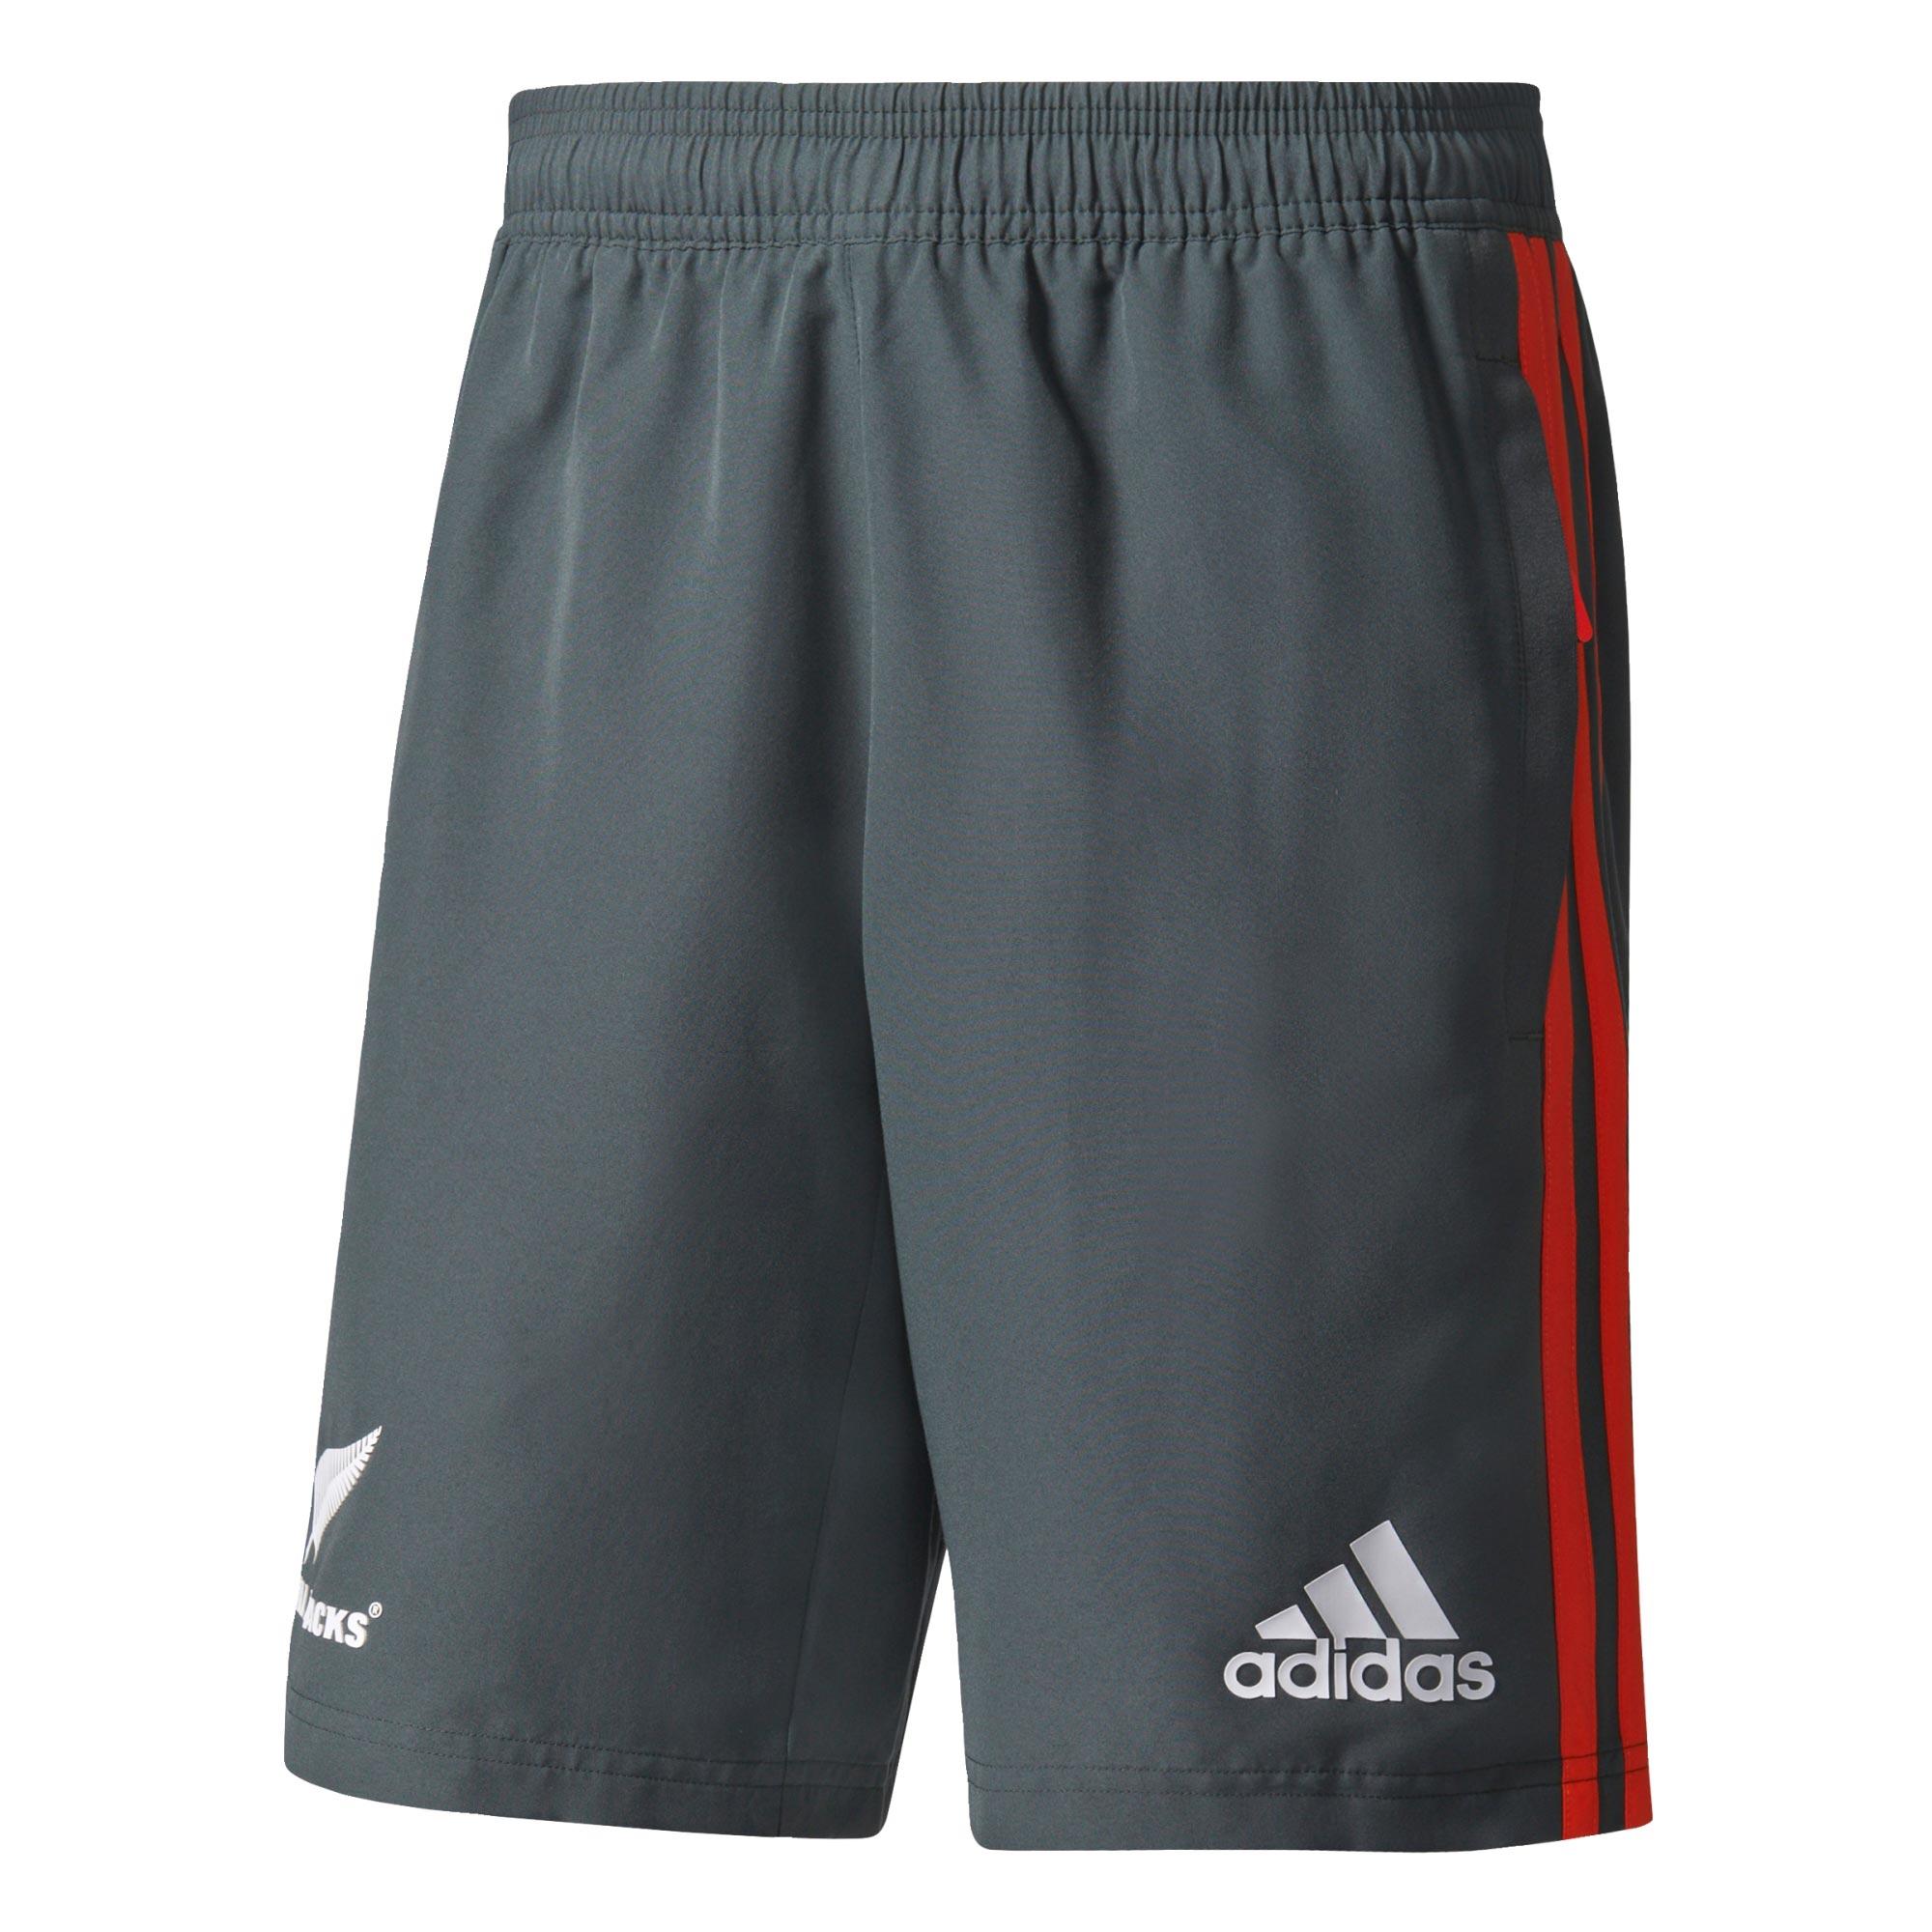 "Image of ""All Blacks Woven Shorts - Dark Grey Heather/Energy/White"""